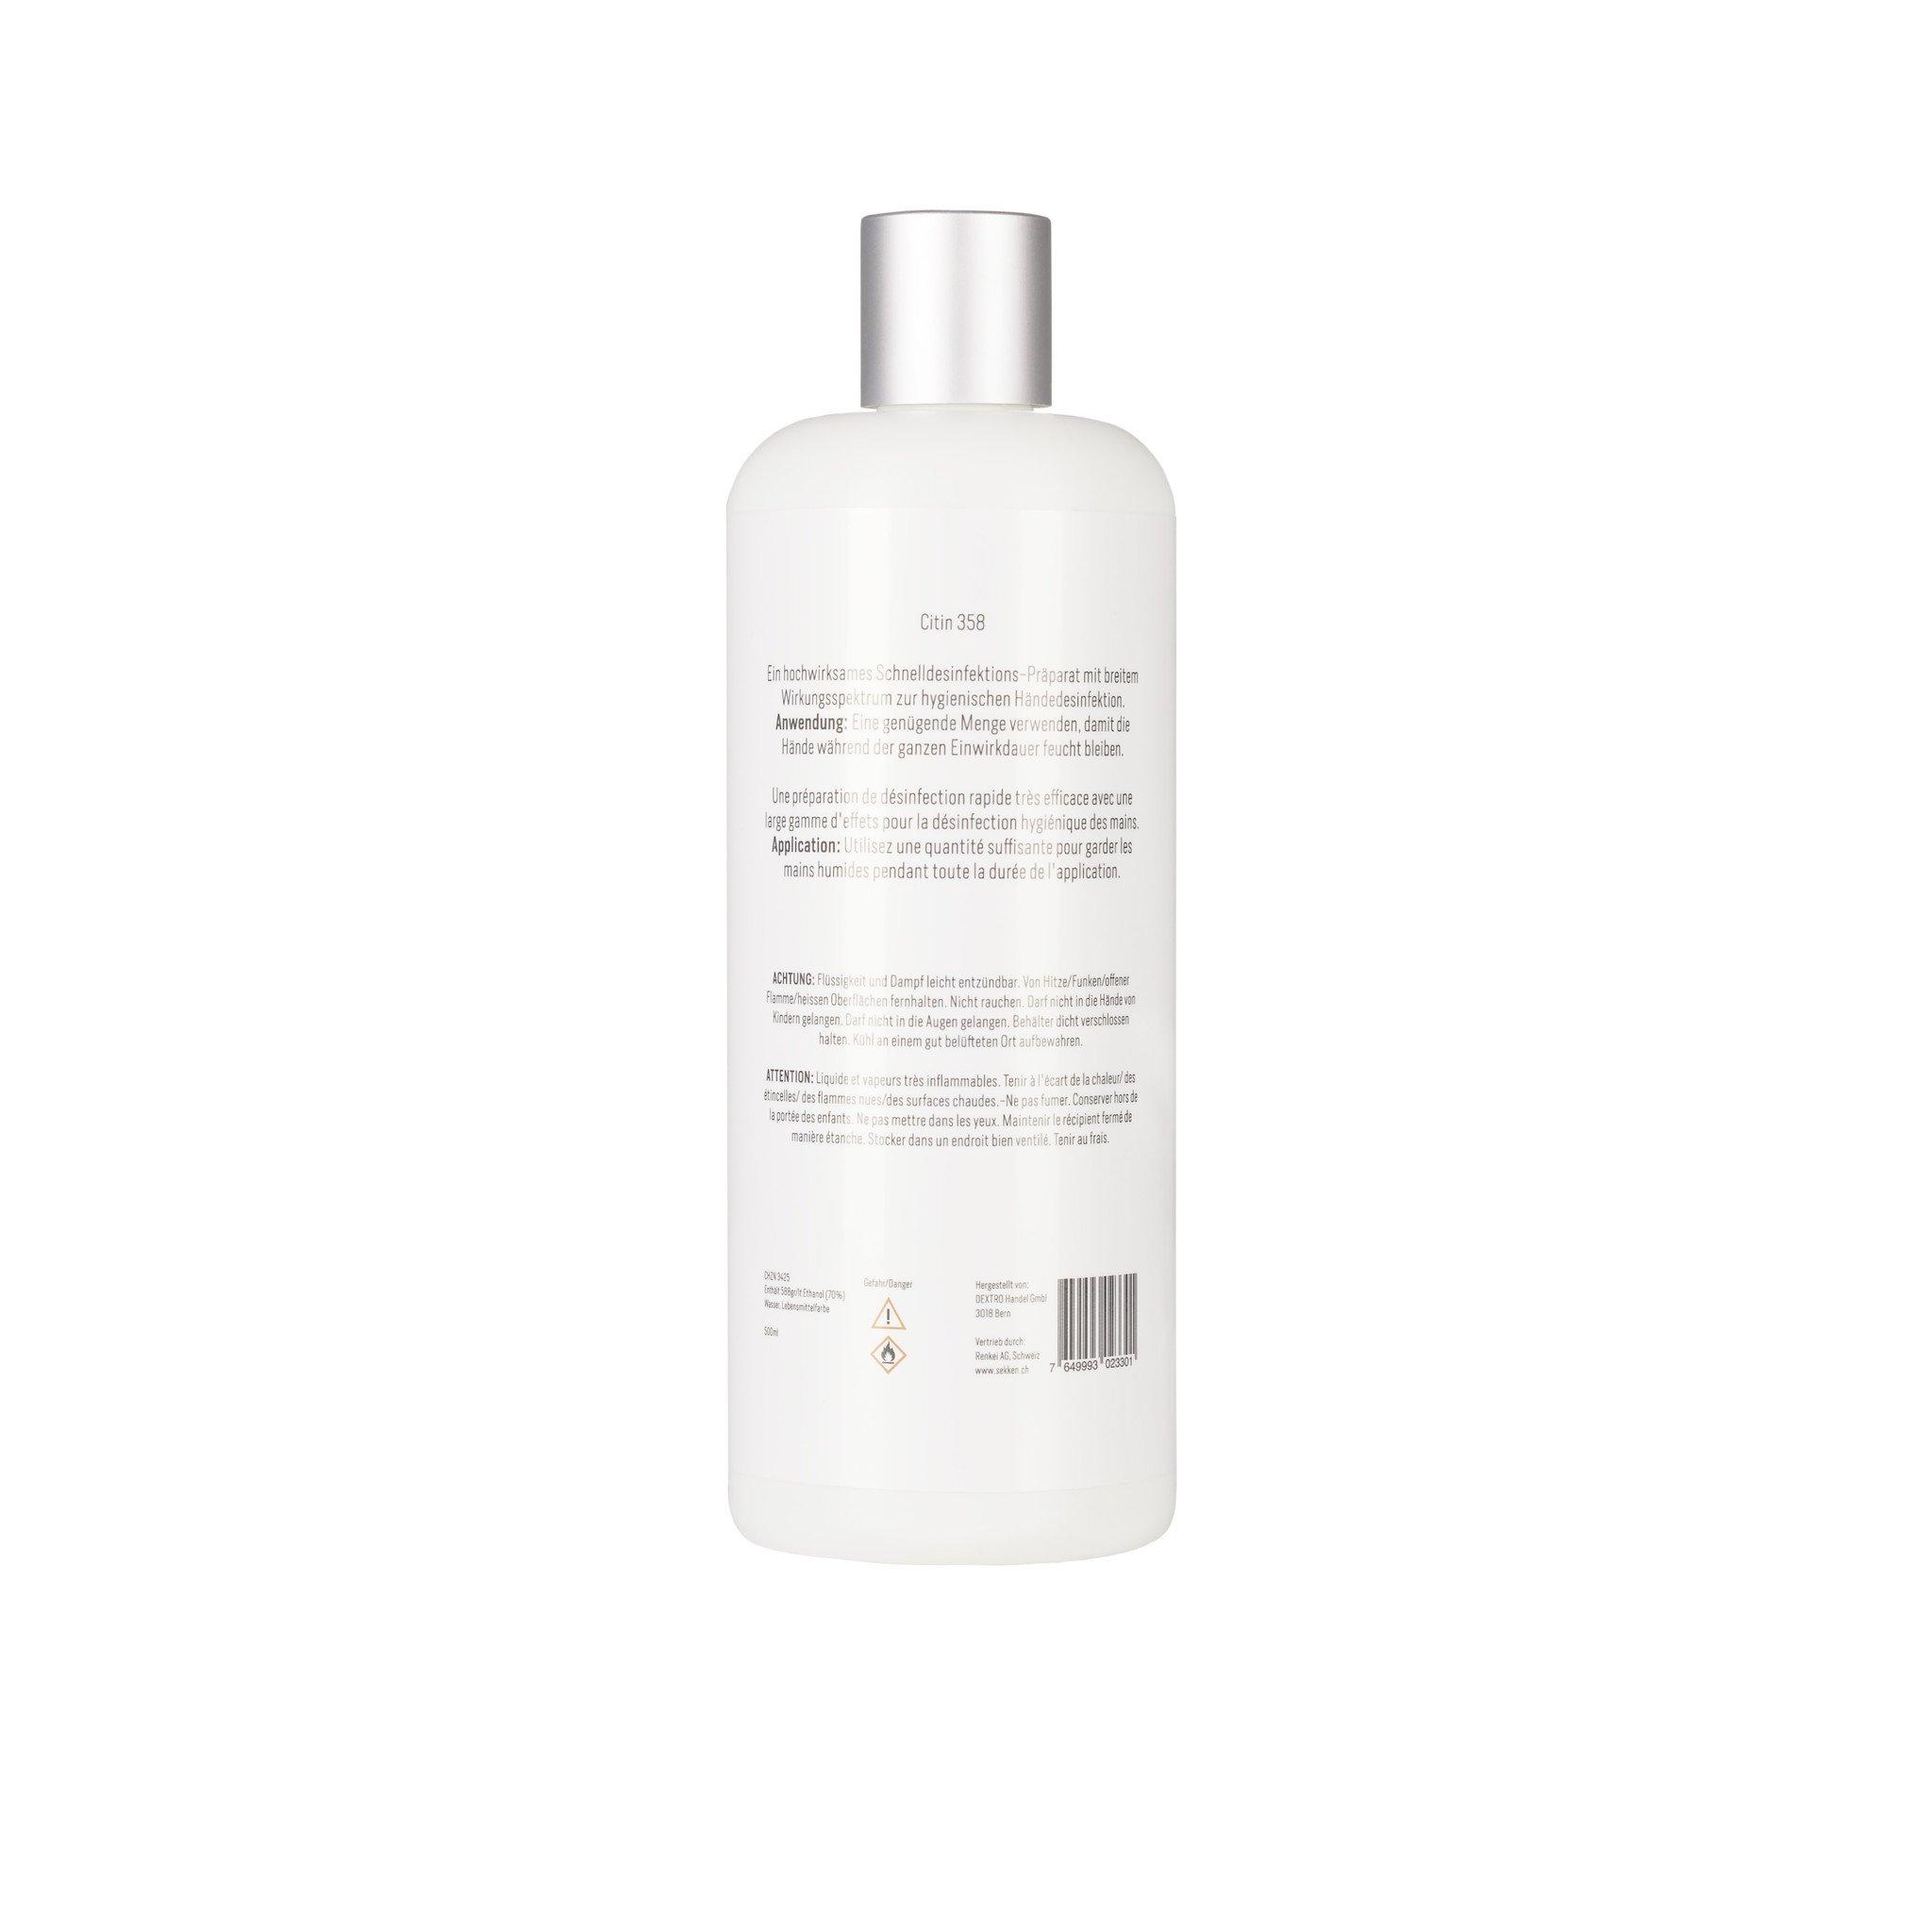 Hand Sanitizer Citin 358 500ml  Promo 24 Pcs-2